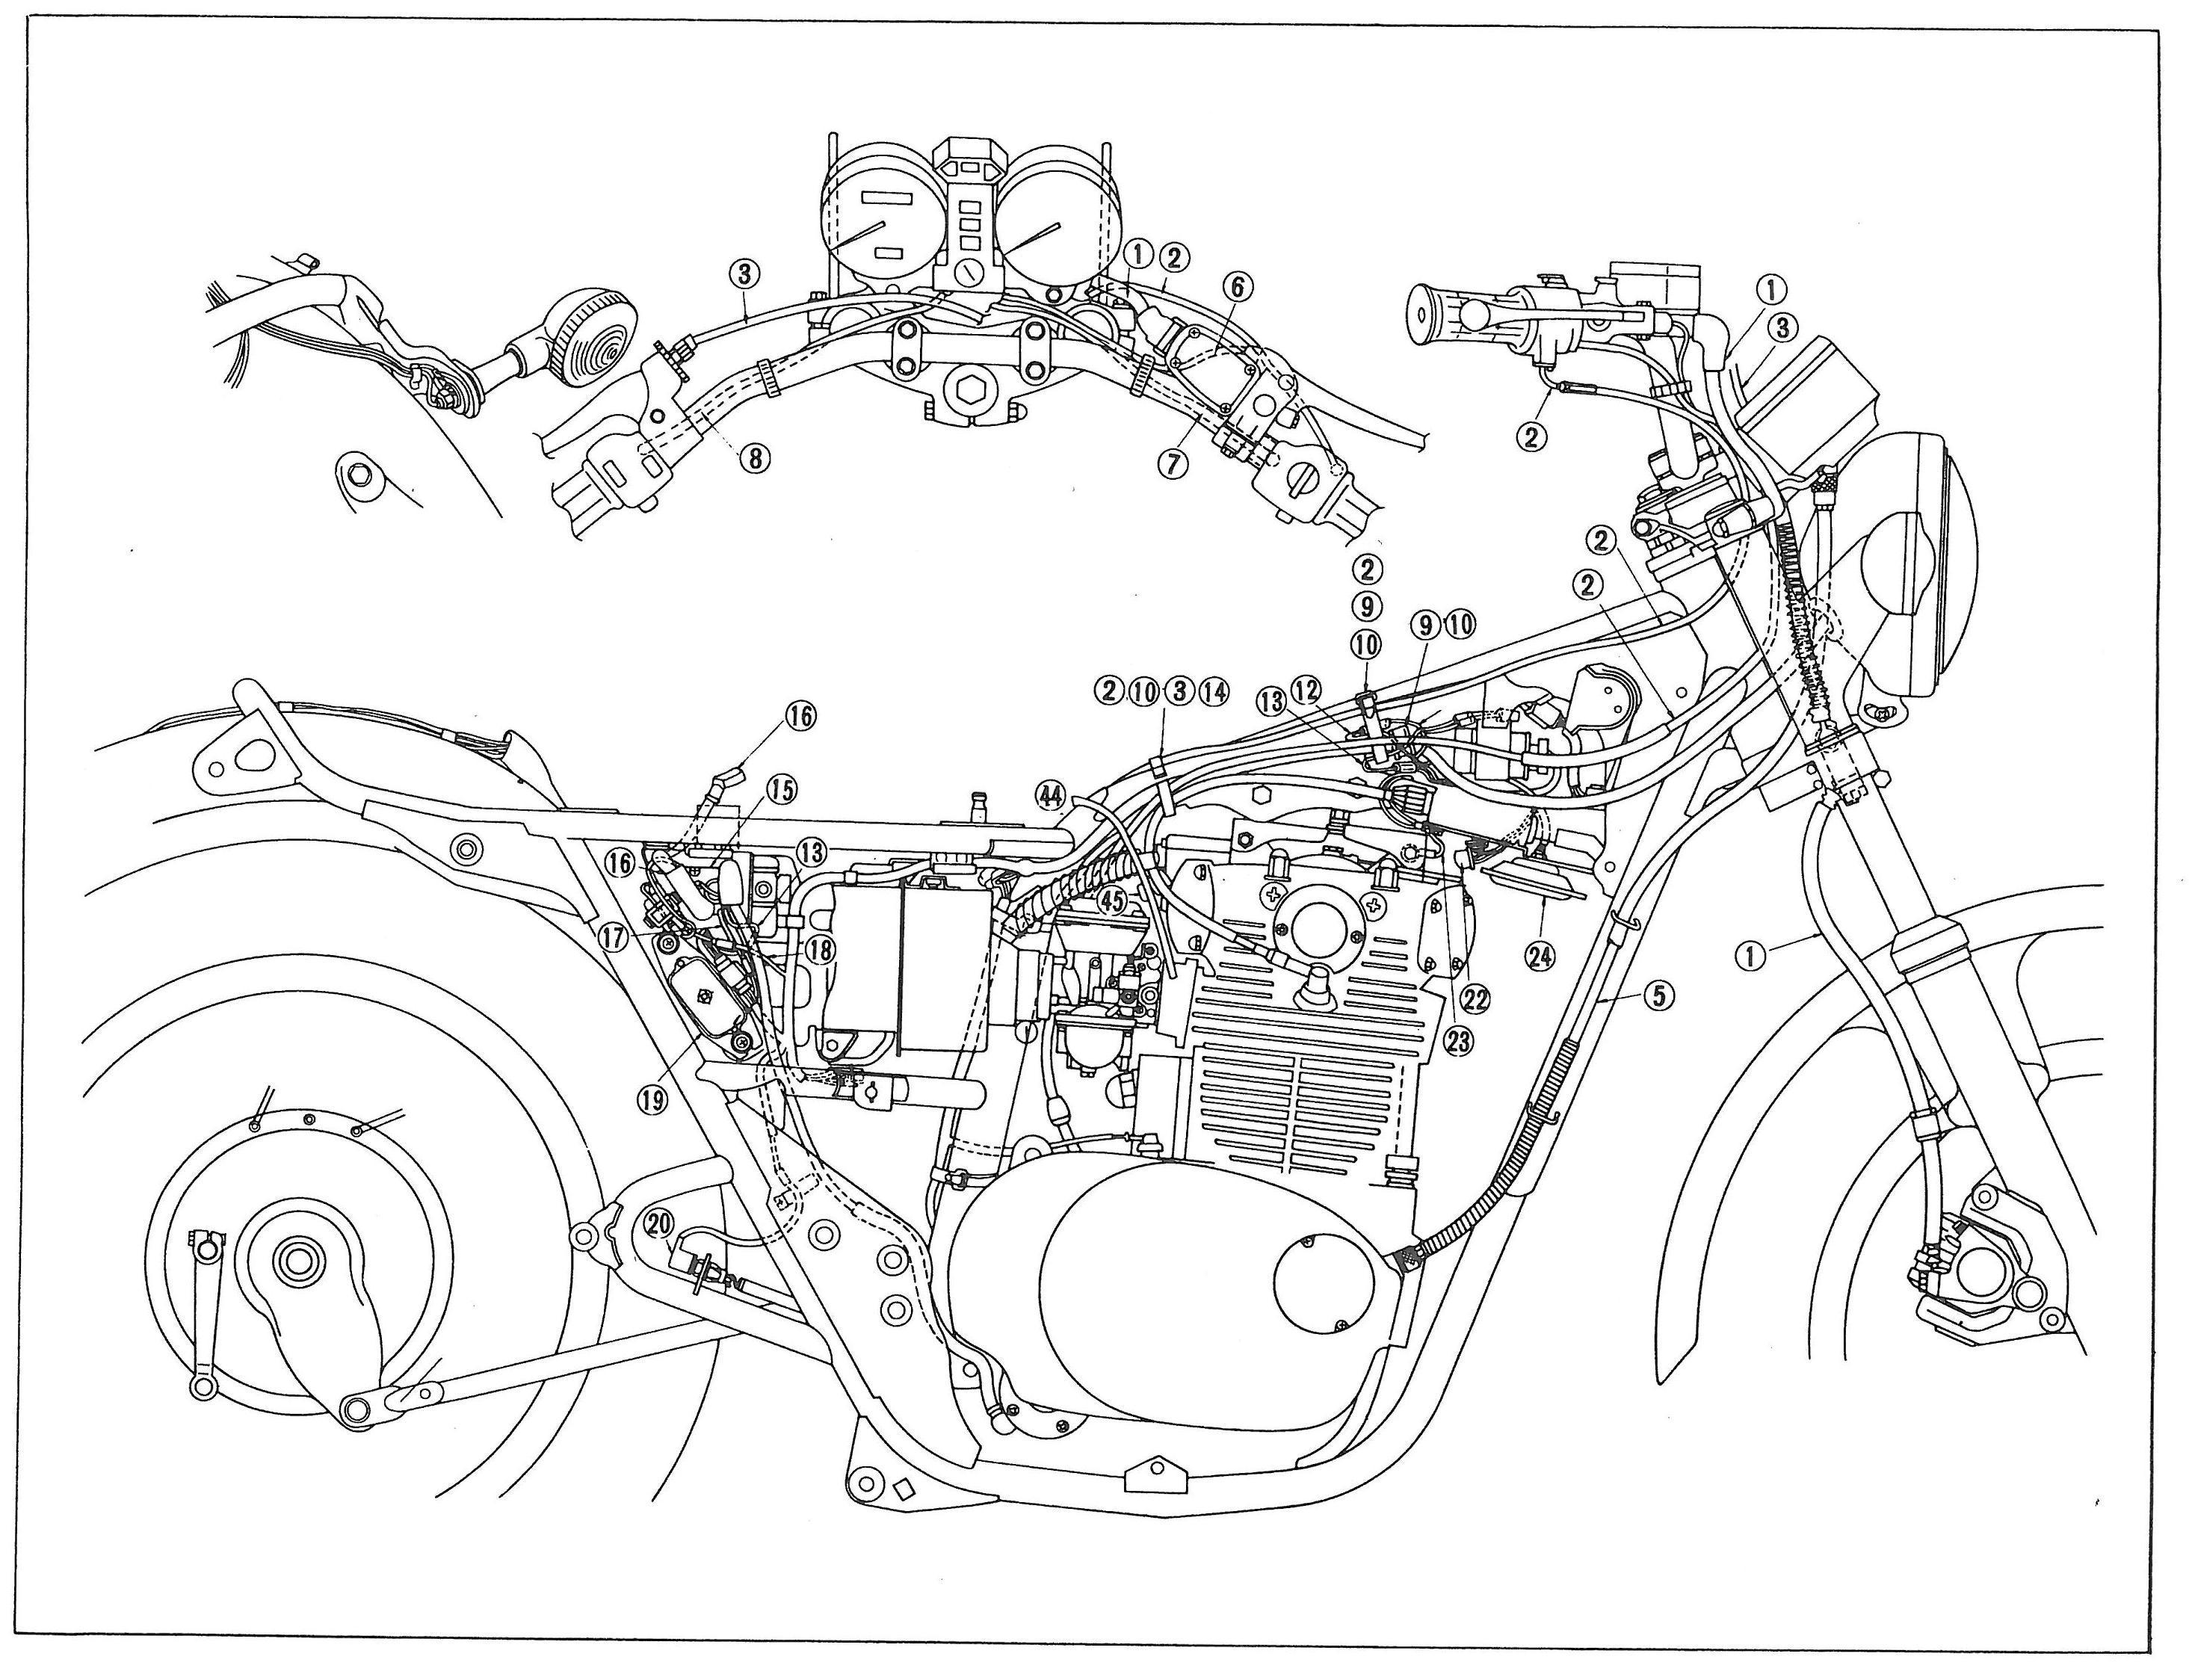 1981 xs650 engine diagram wiring diagram used 1981 xs650 engine diagram [ 2929 x 2248 Pixel ]